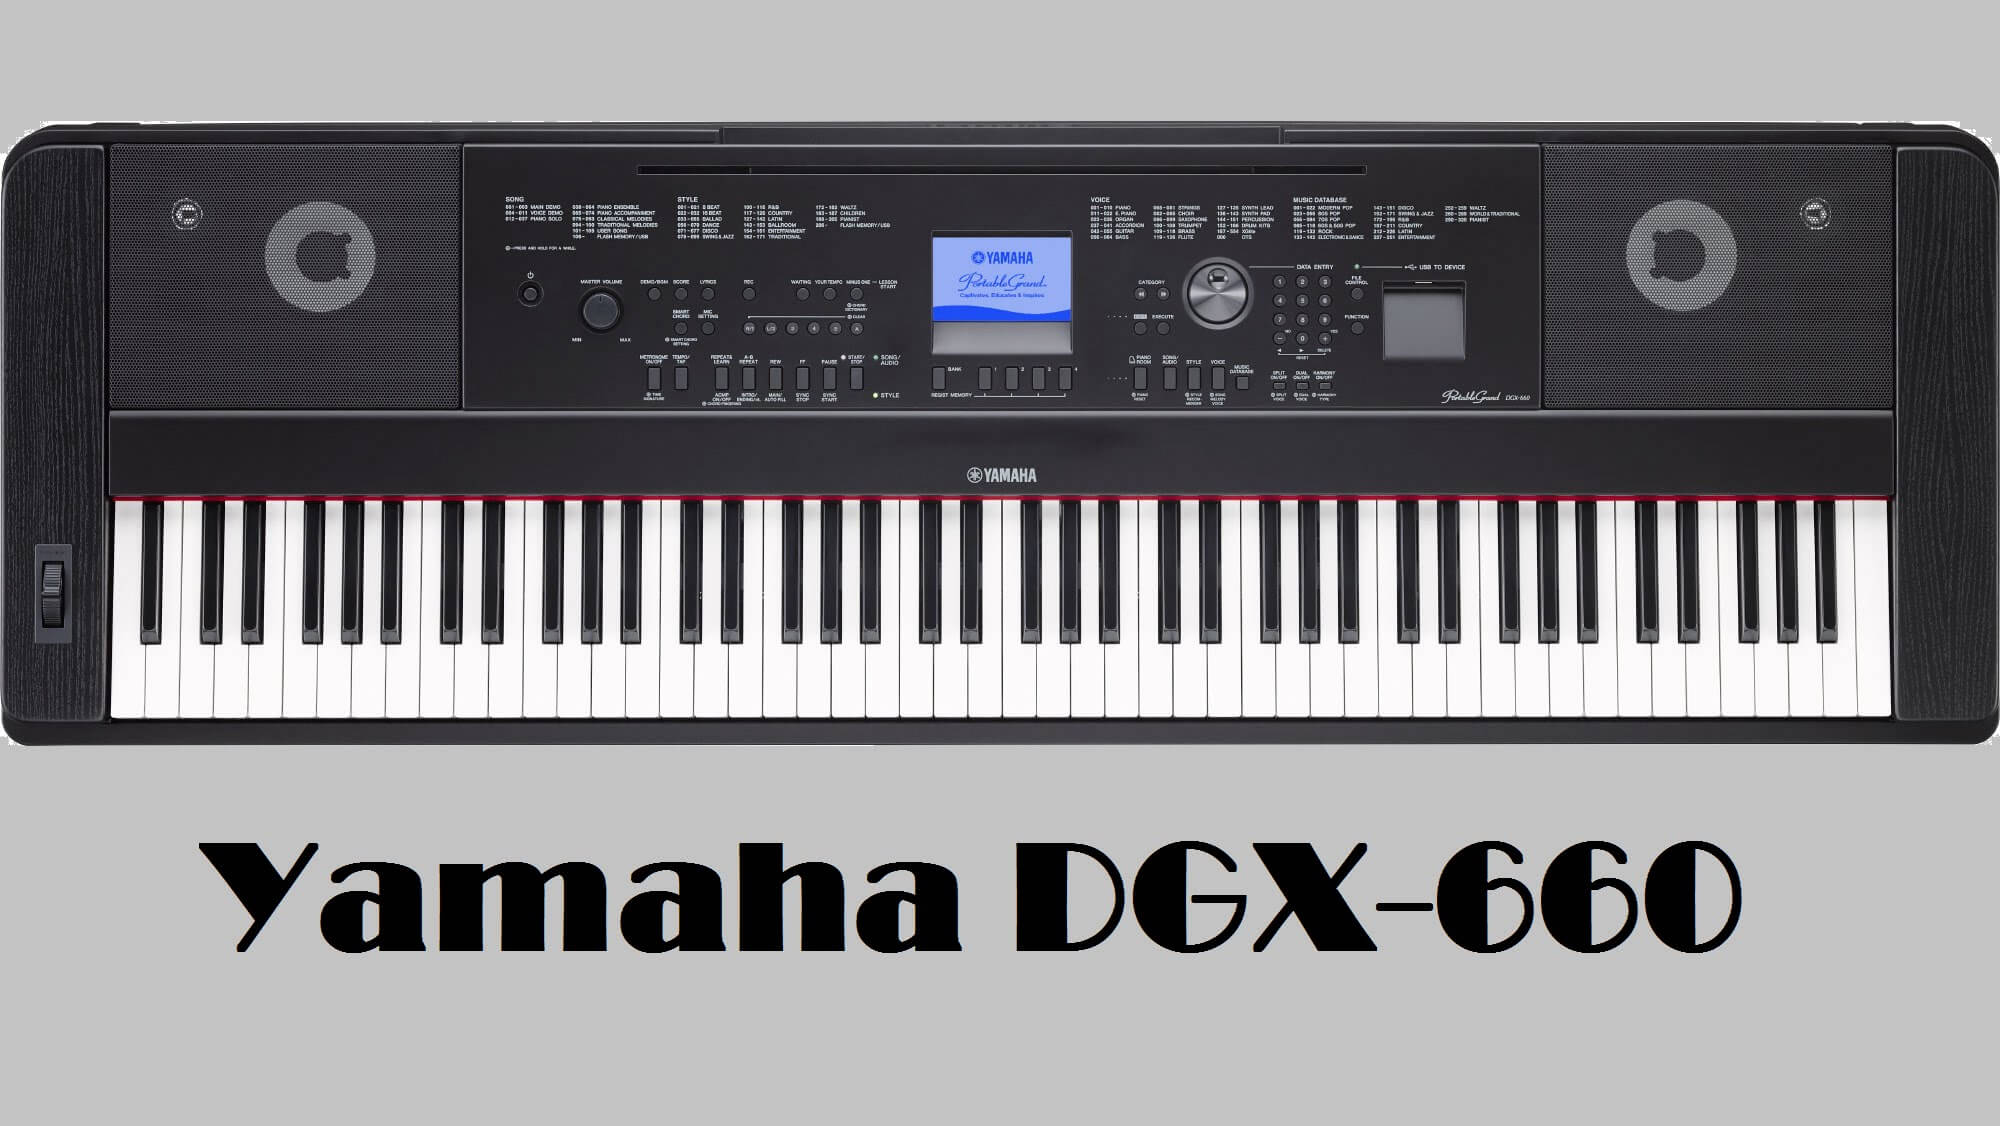 yamaha dgx 660 digital piano review 2018 digital piano reviews 2018. Black Bedroom Furniture Sets. Home Design Ideas